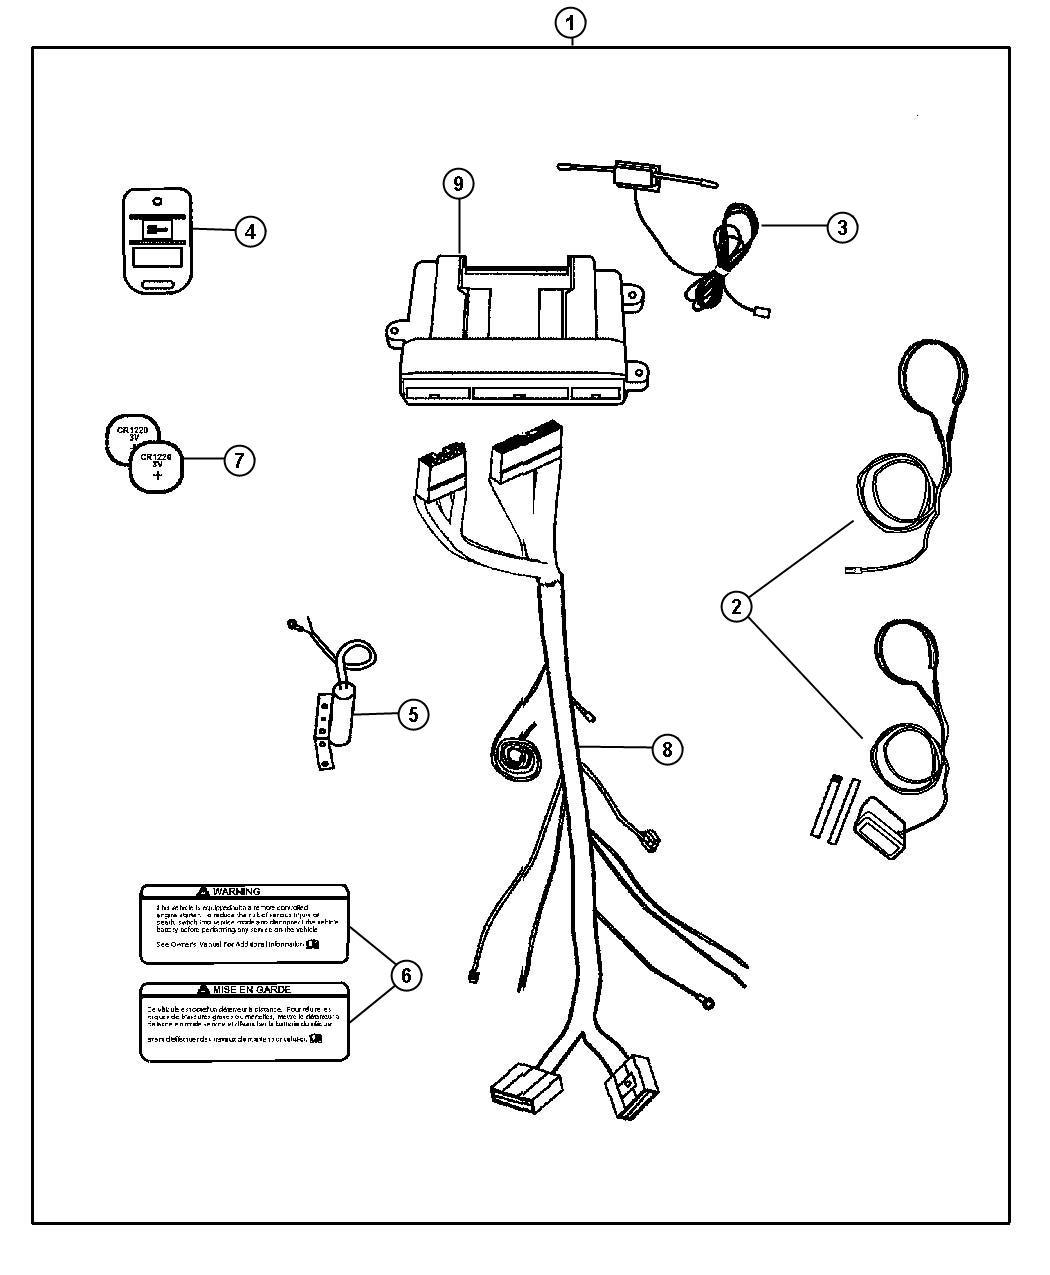 Remote Starter Kit Installation Software Free Download